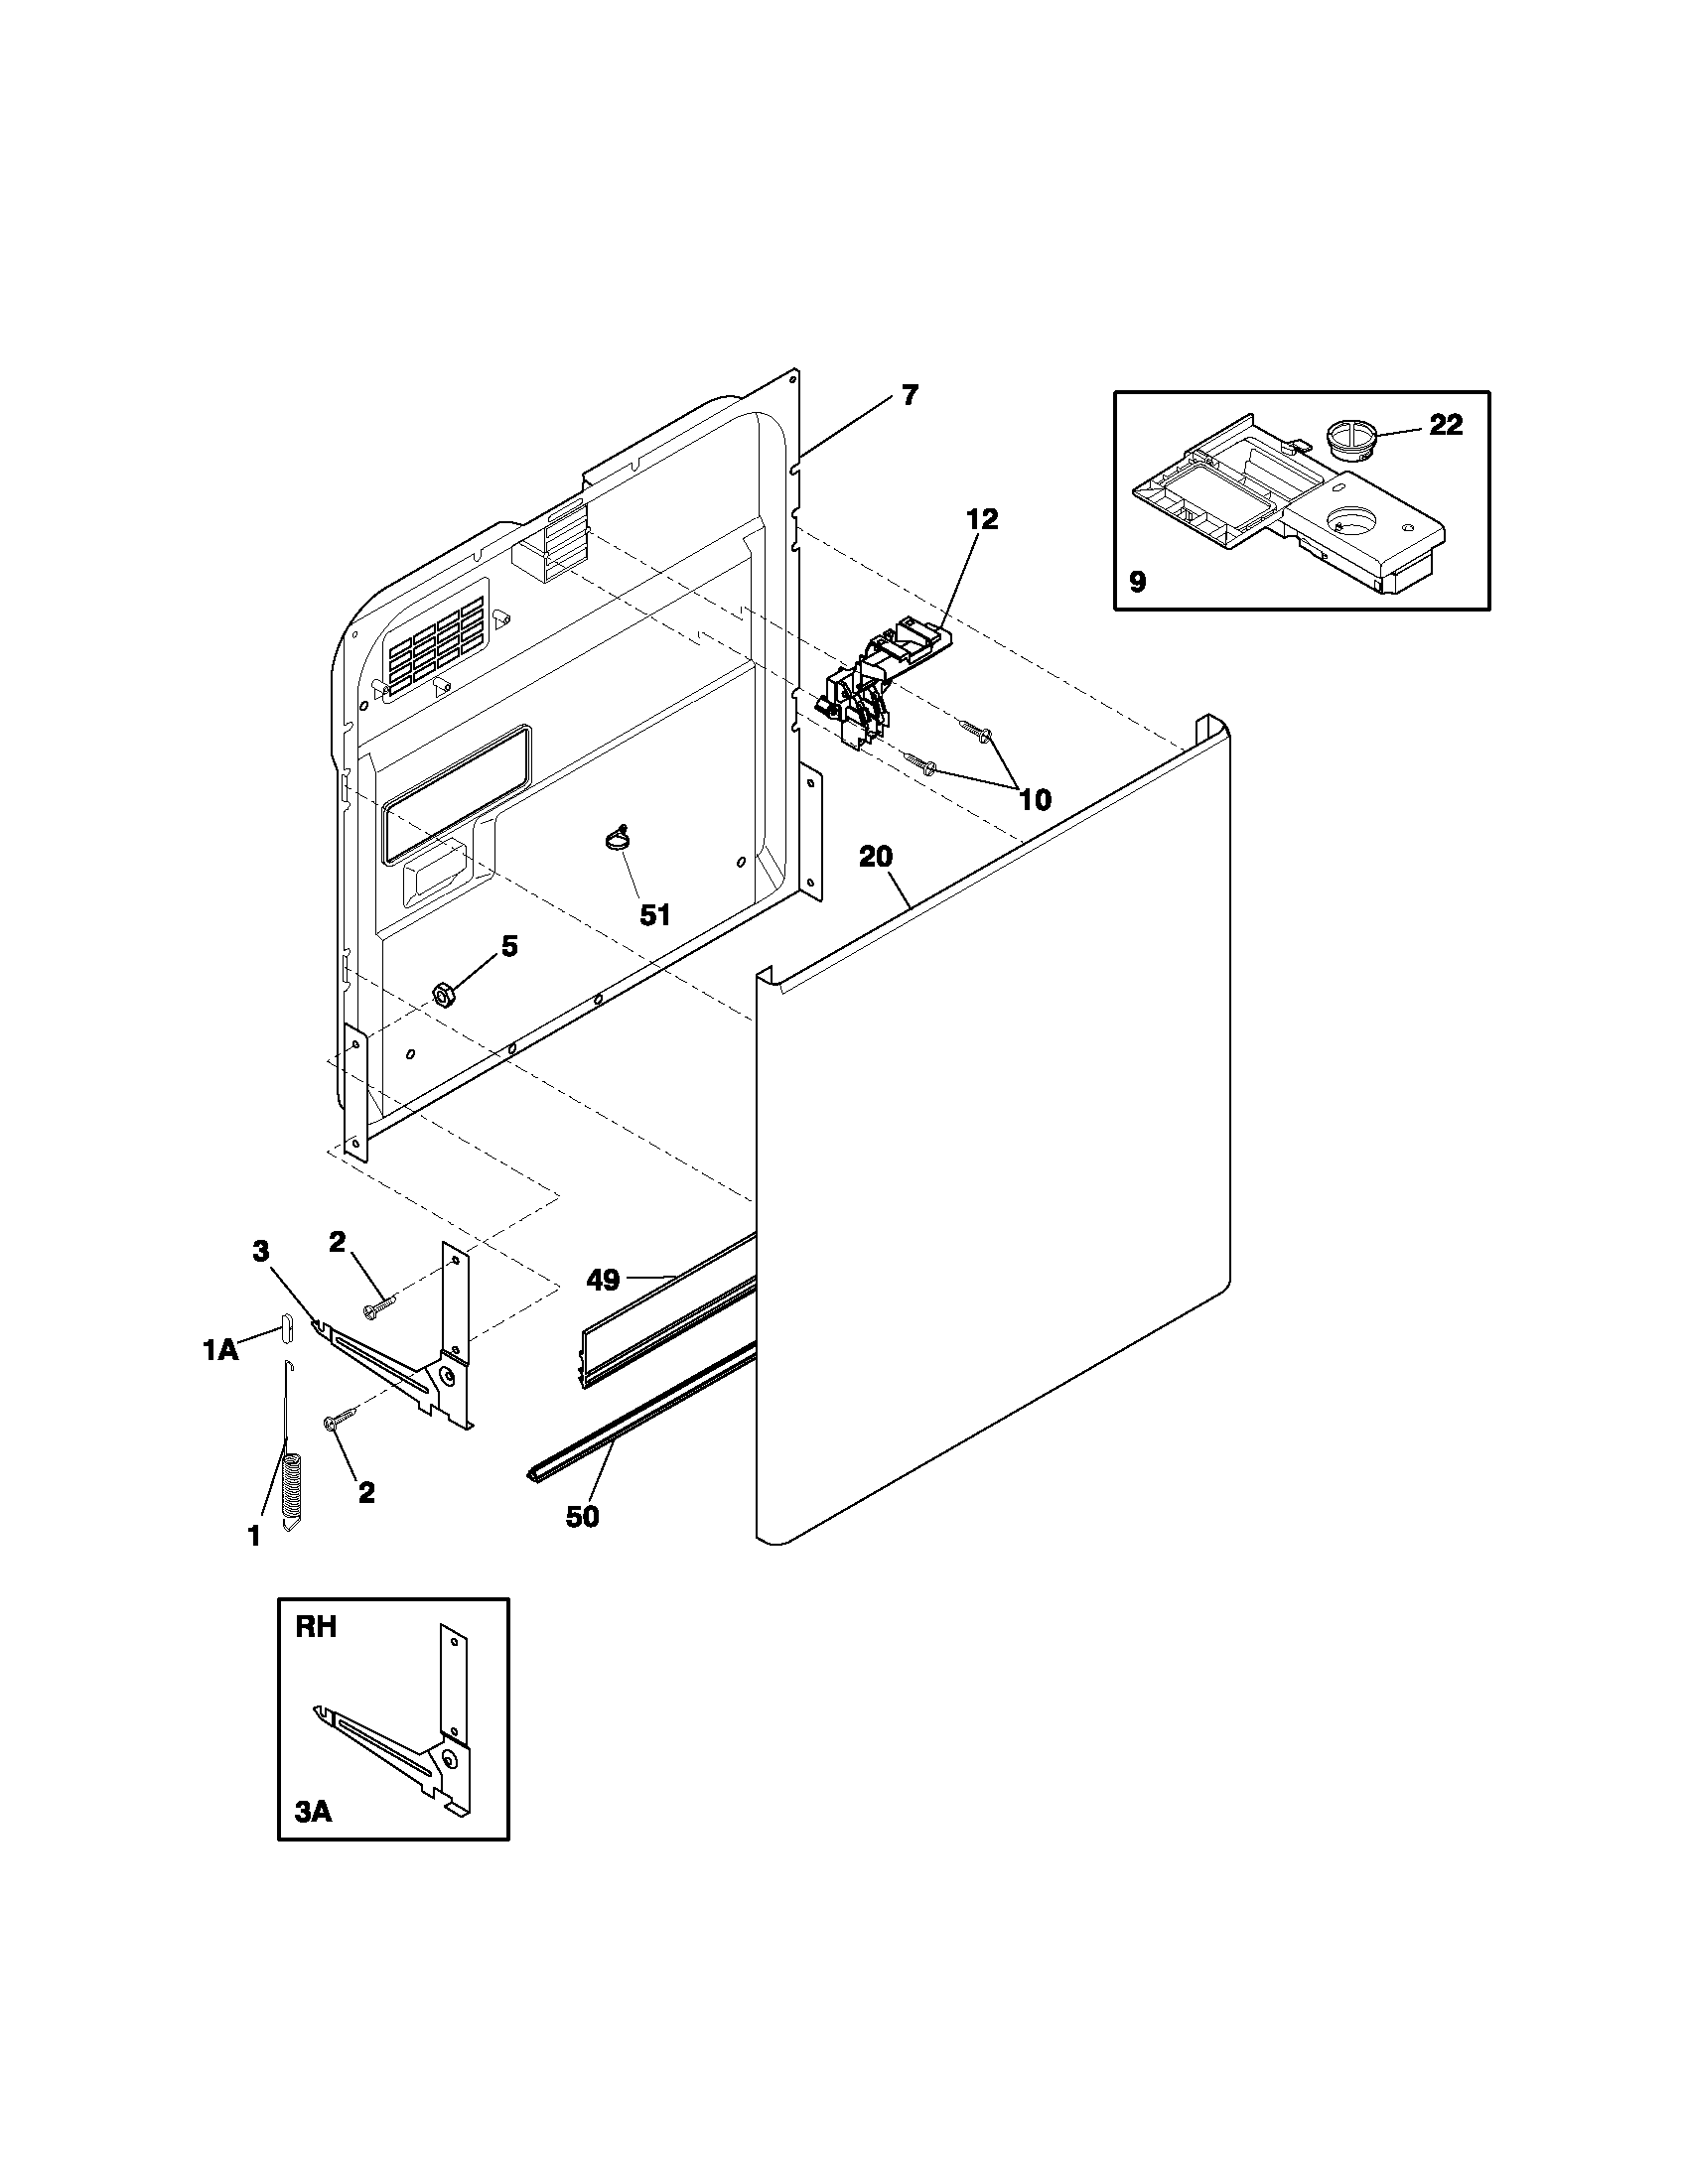 bosch dishwasher wiring diagram on ge dishwasher diagram of parts